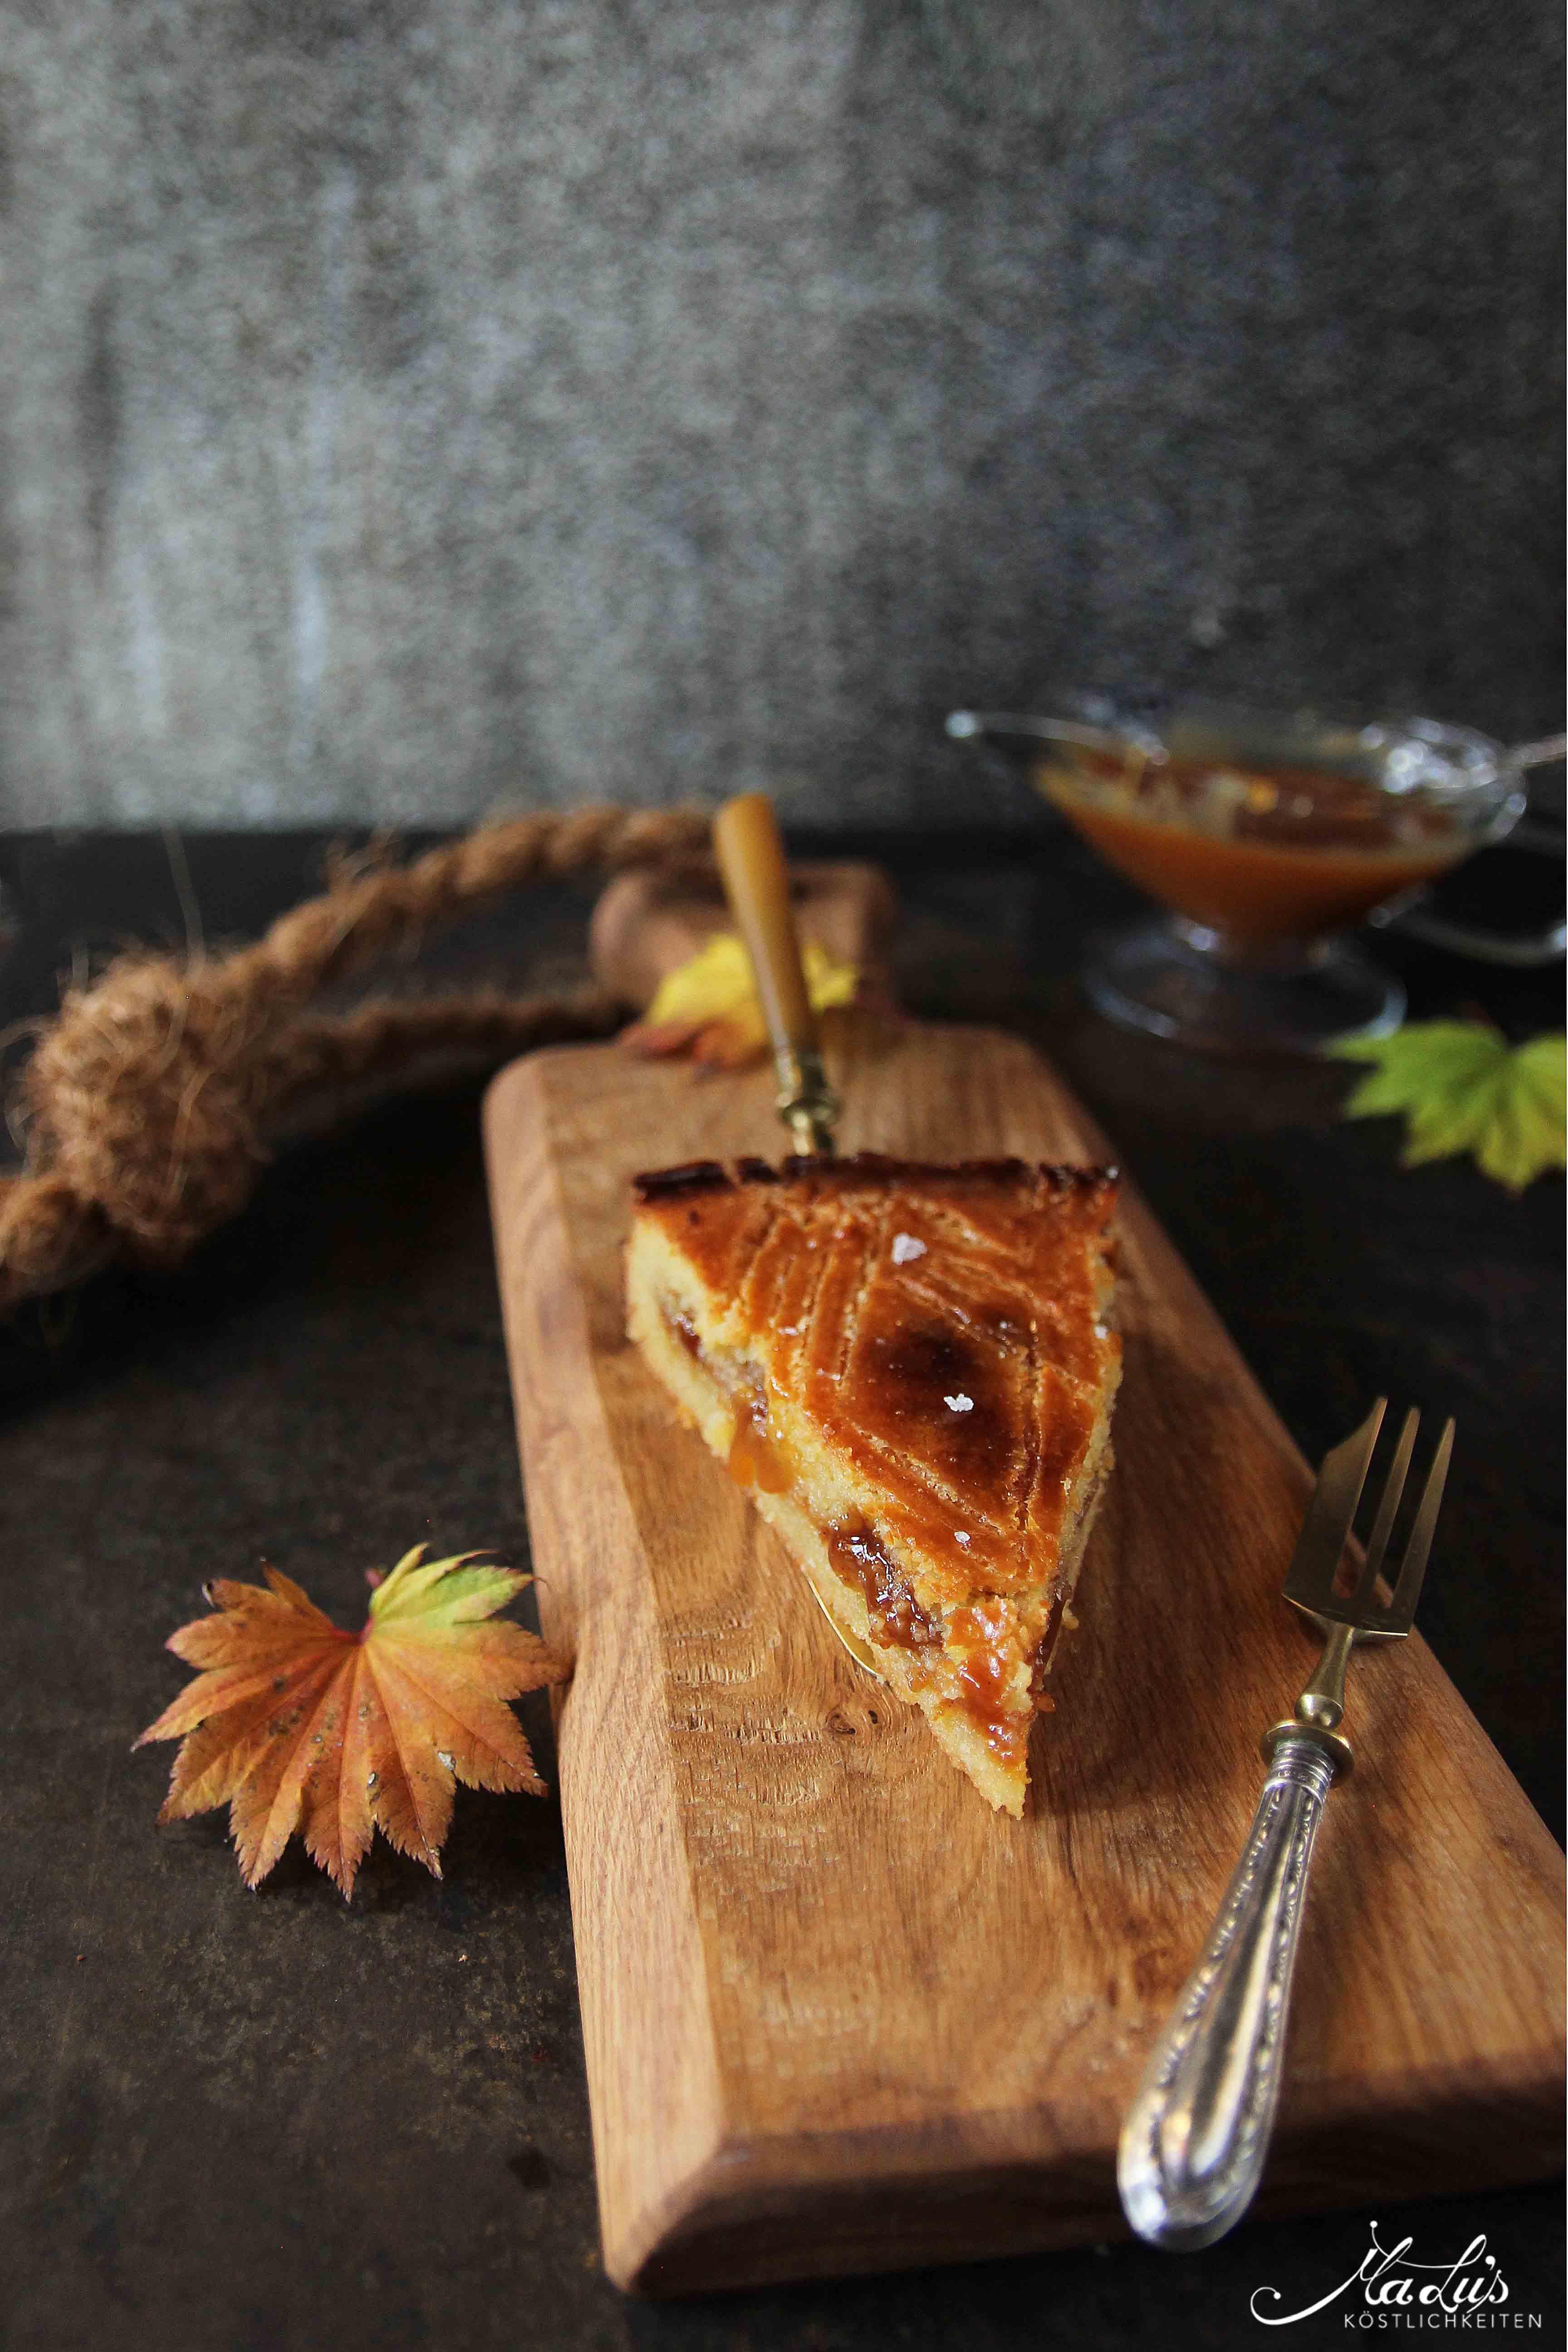 Gâteau Breton mit Salzkaramell